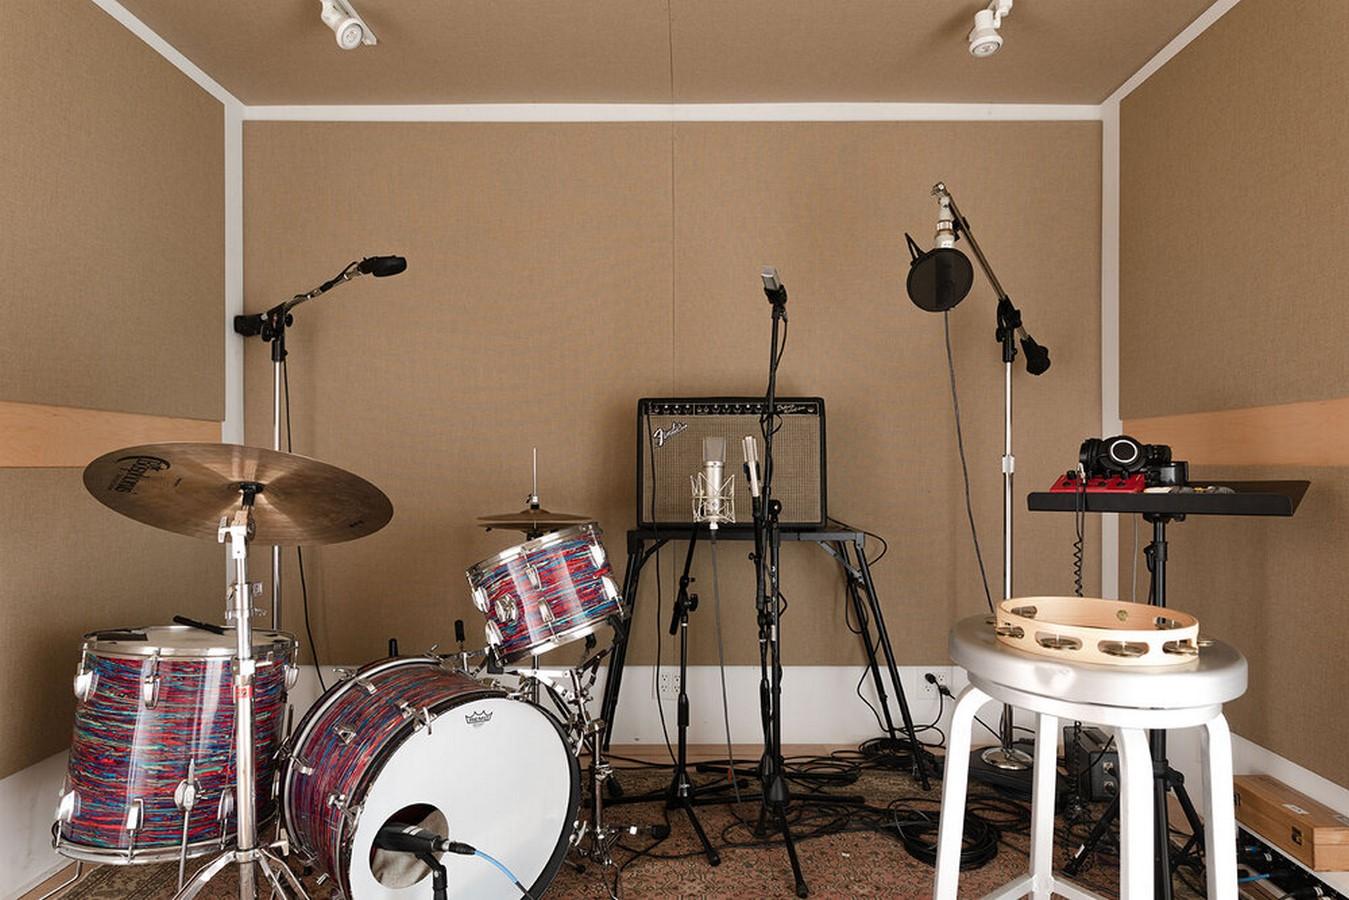 VENICE BEACH RECORDING STUDIO - Sheet4